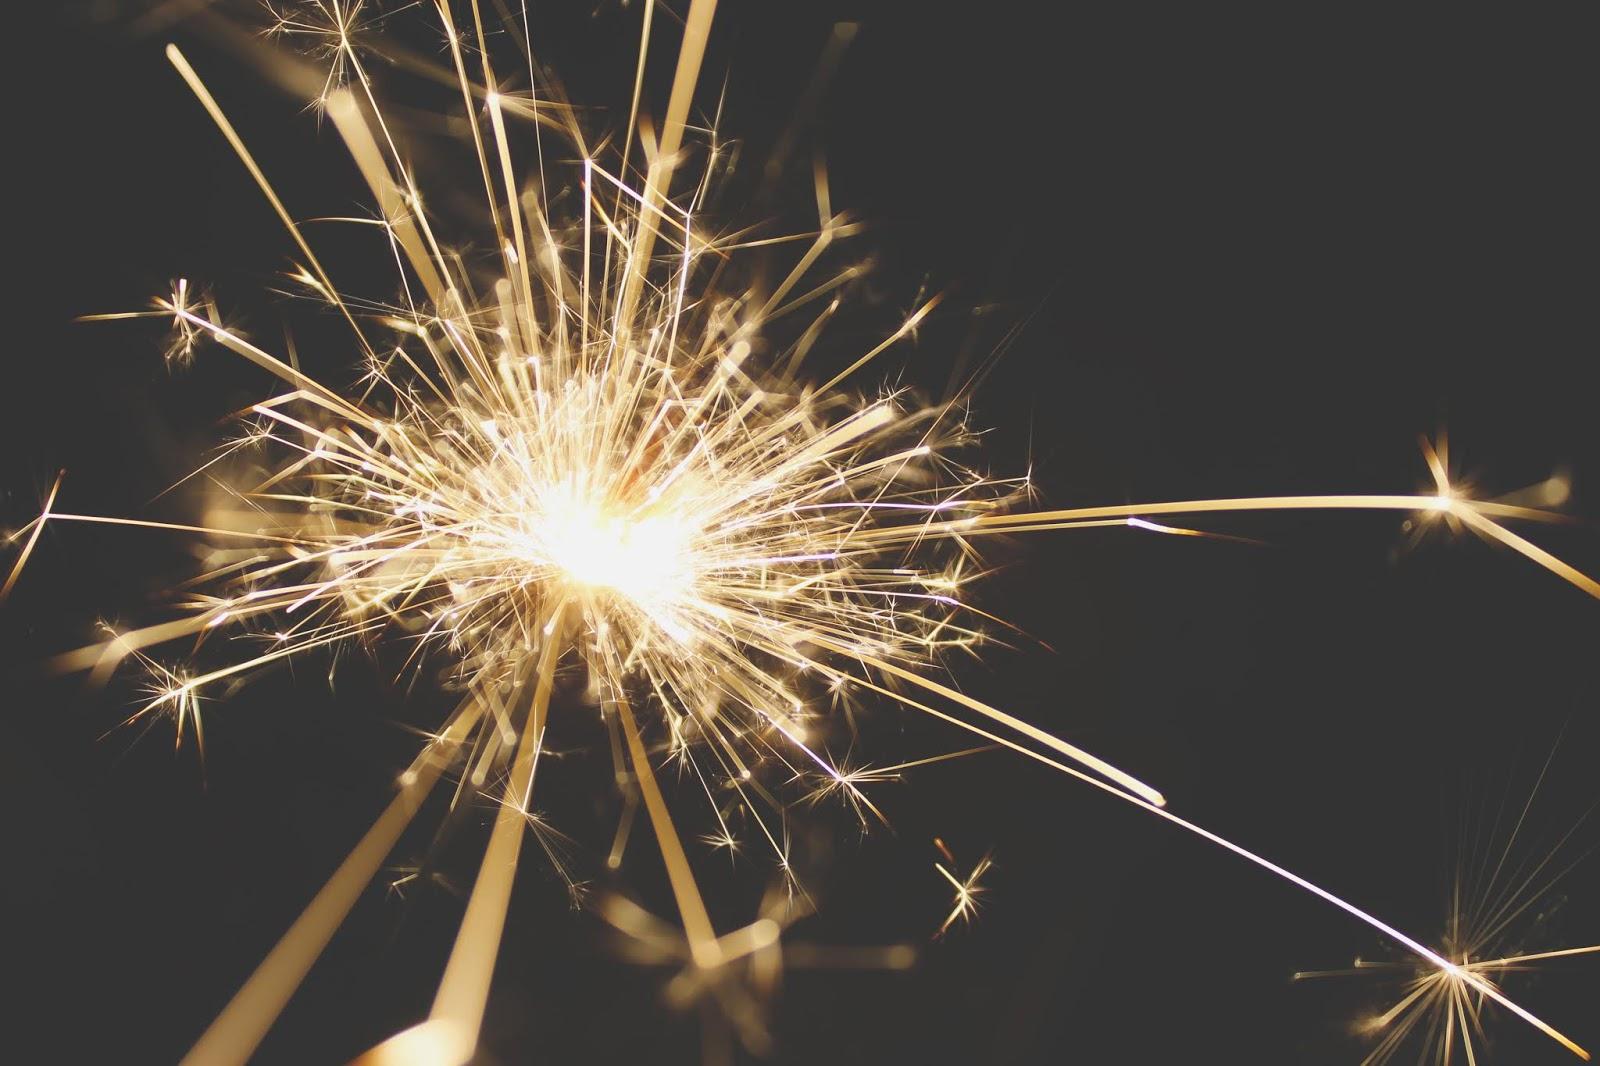 Happy Diwali Images 2019 free